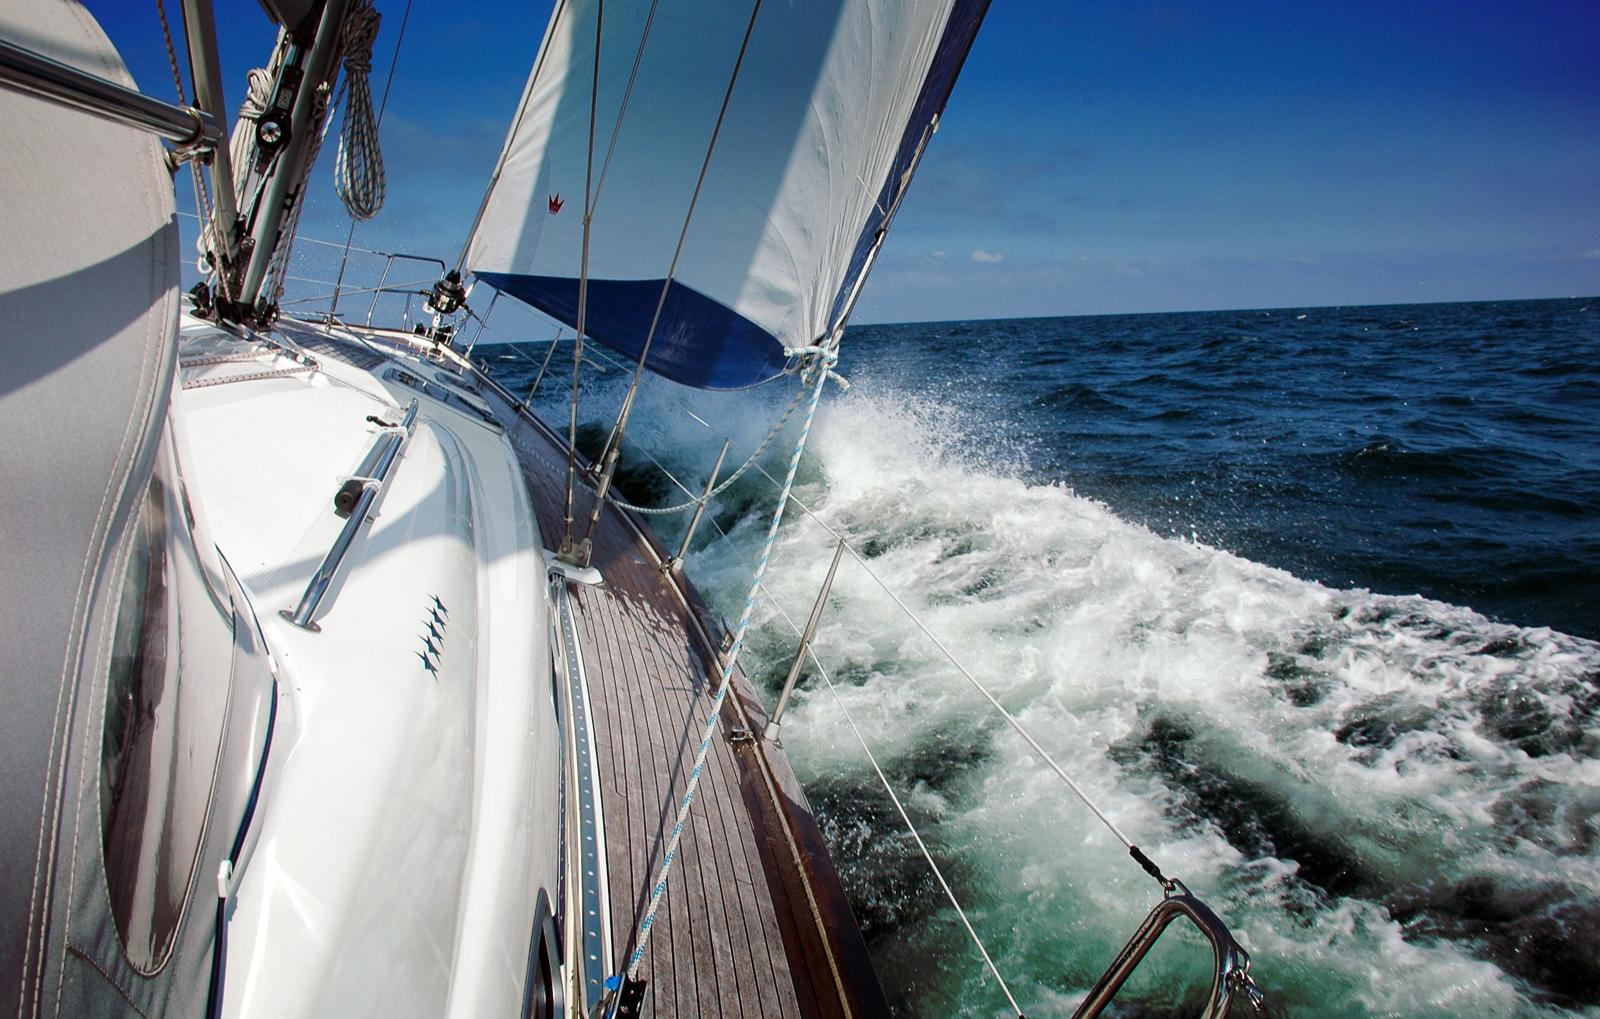 regattasegeln-rostock-warnemuende-bg3